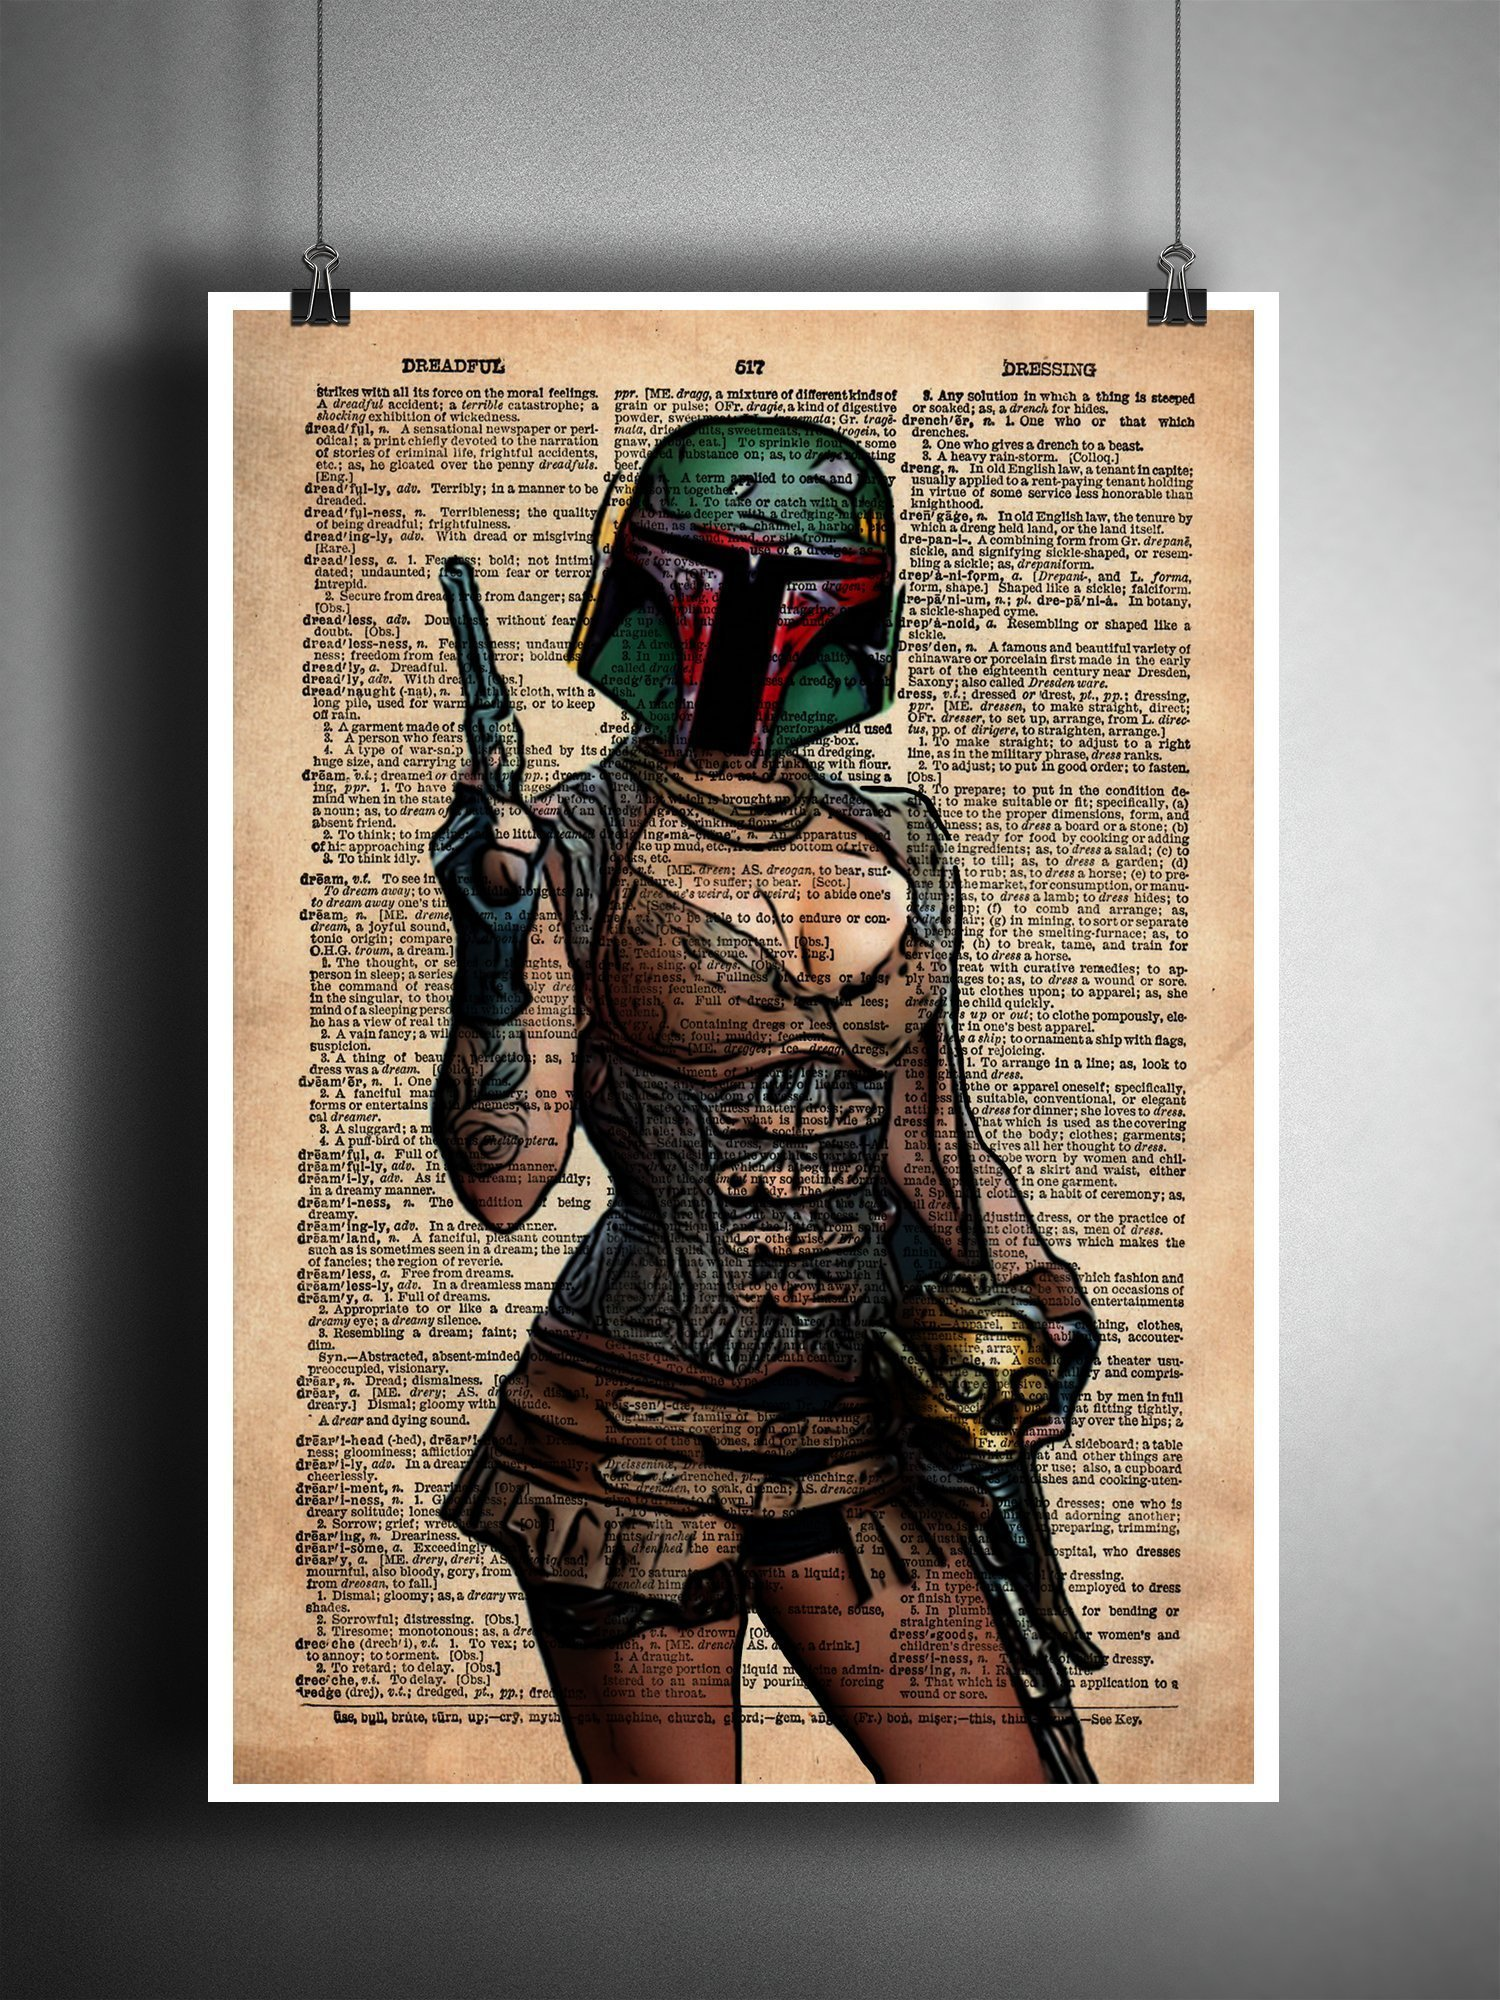 Boba Fett pin up girl, star wars art, sexy star wars, cool pop art, vintage dictionary art print 5